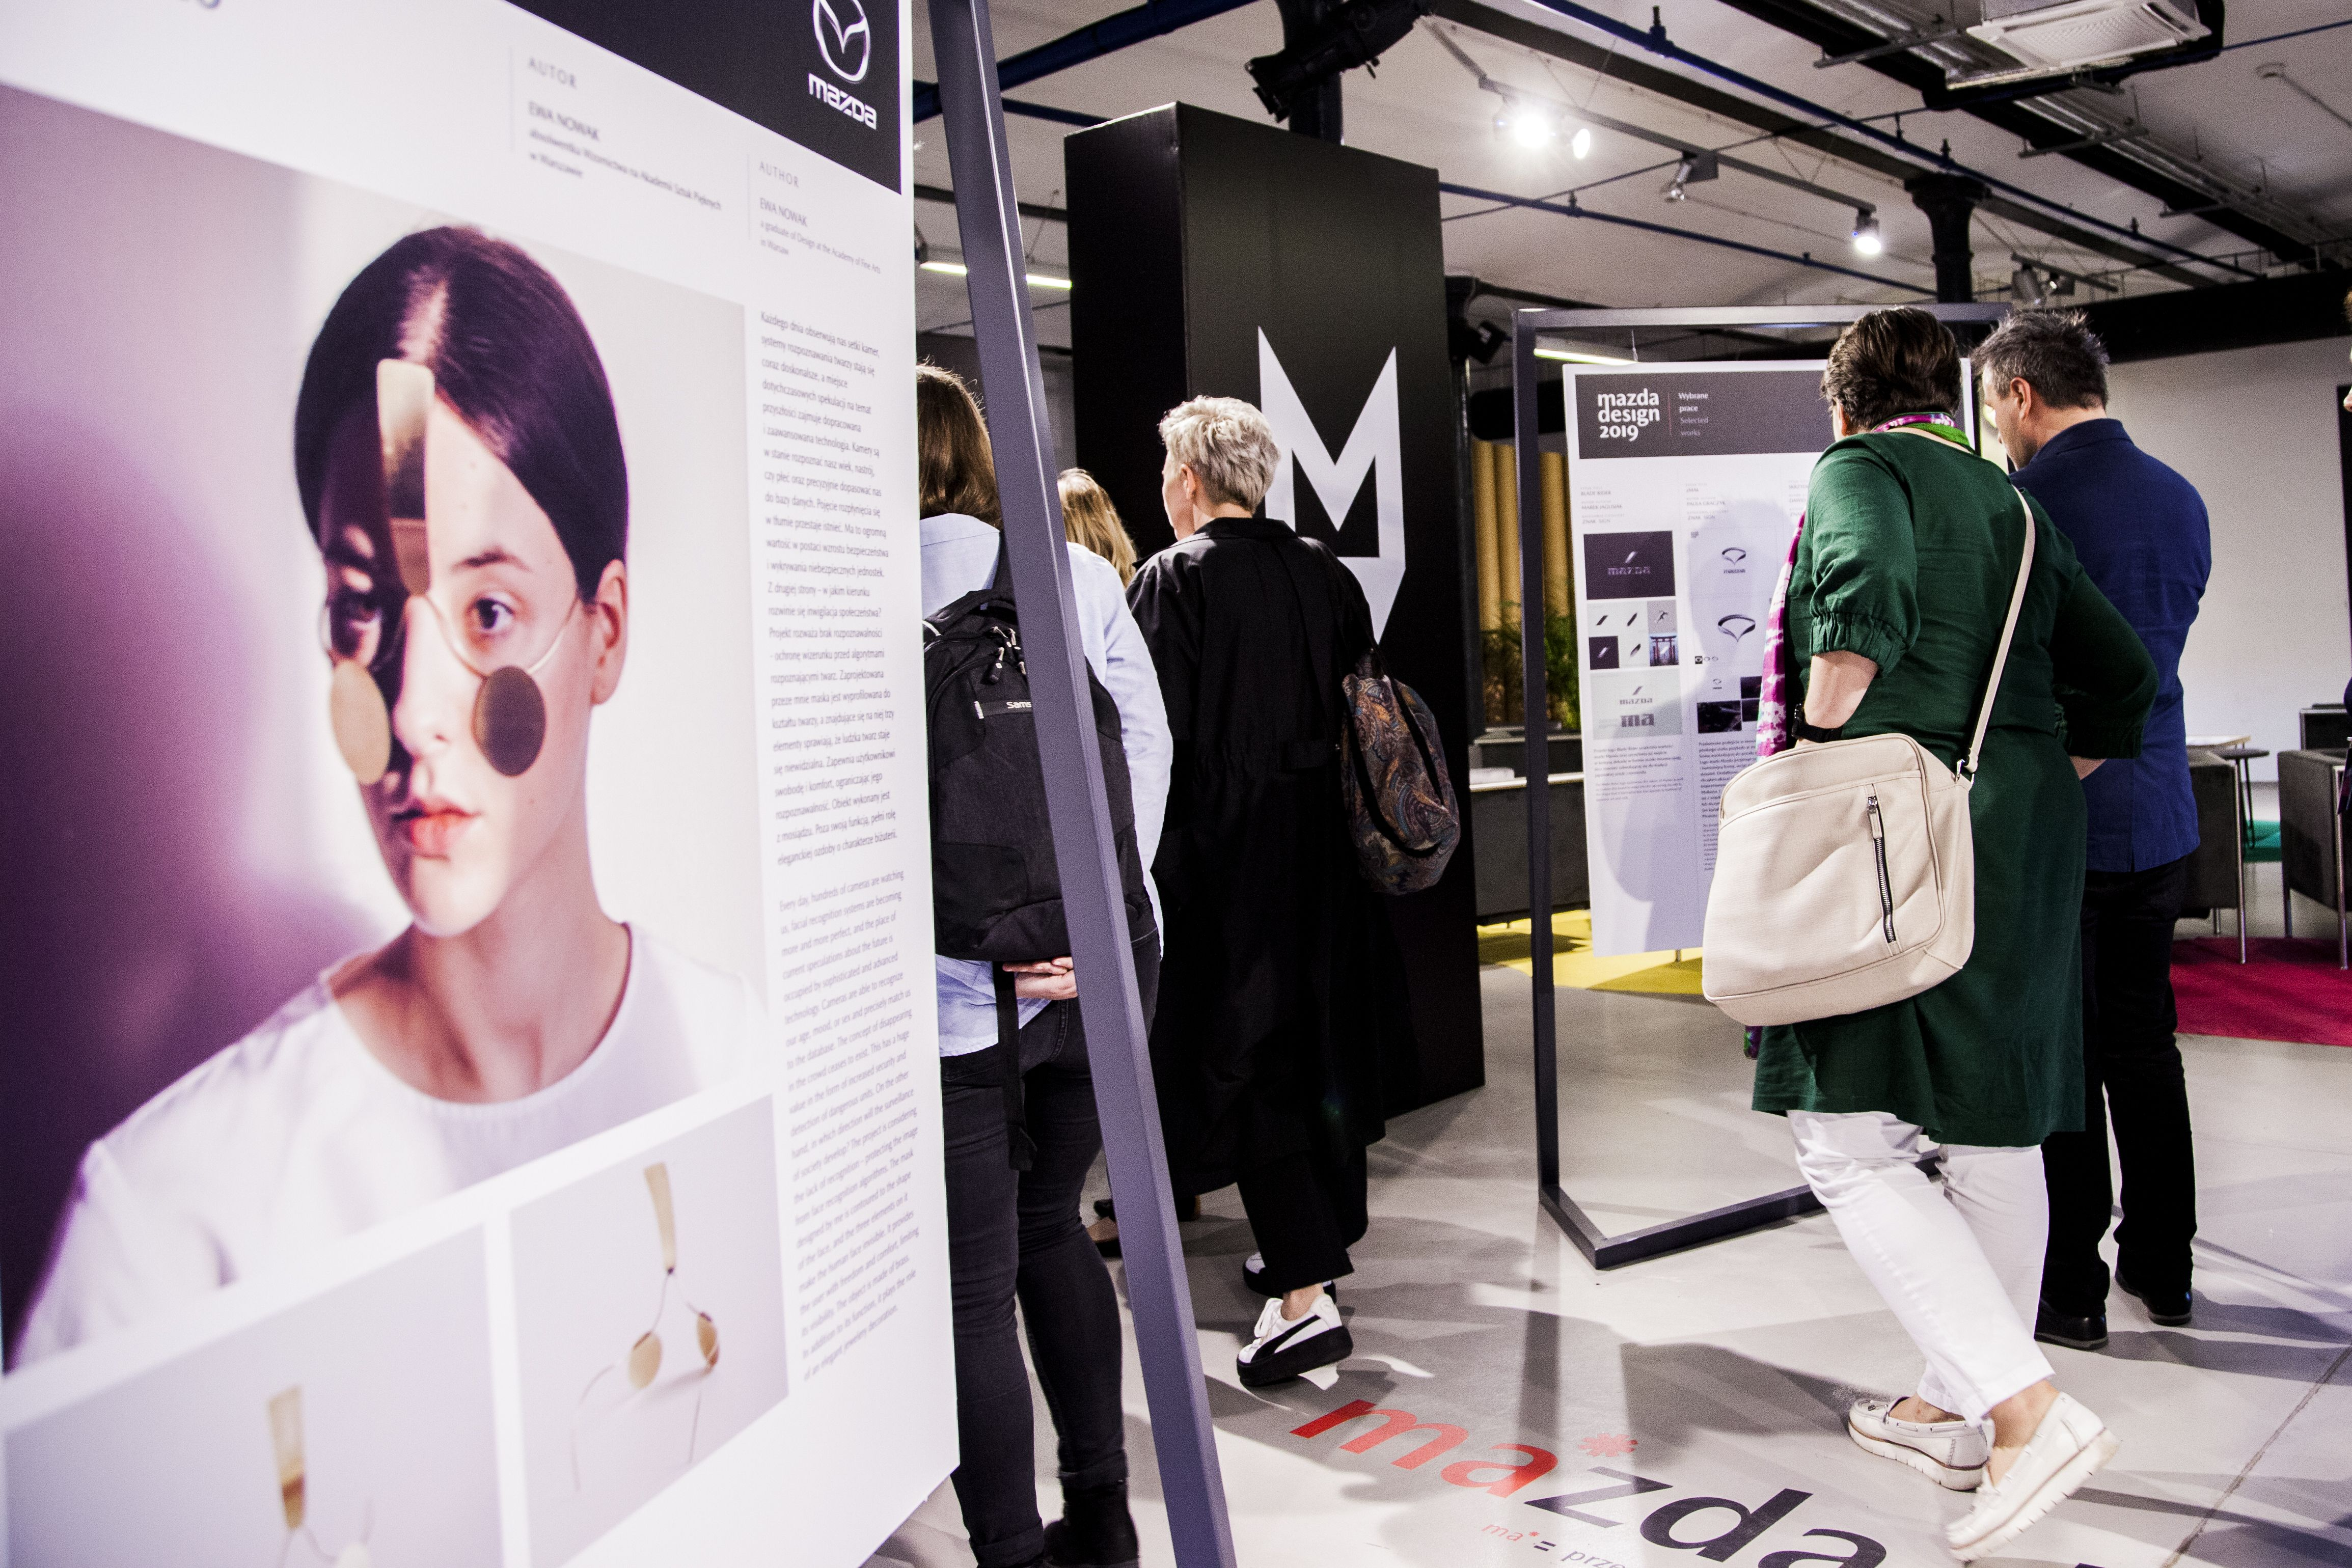 Znajdz Sposob Na Dobre Zycie Na Lodz Design Festival 2019 Festival Design Design Lodz